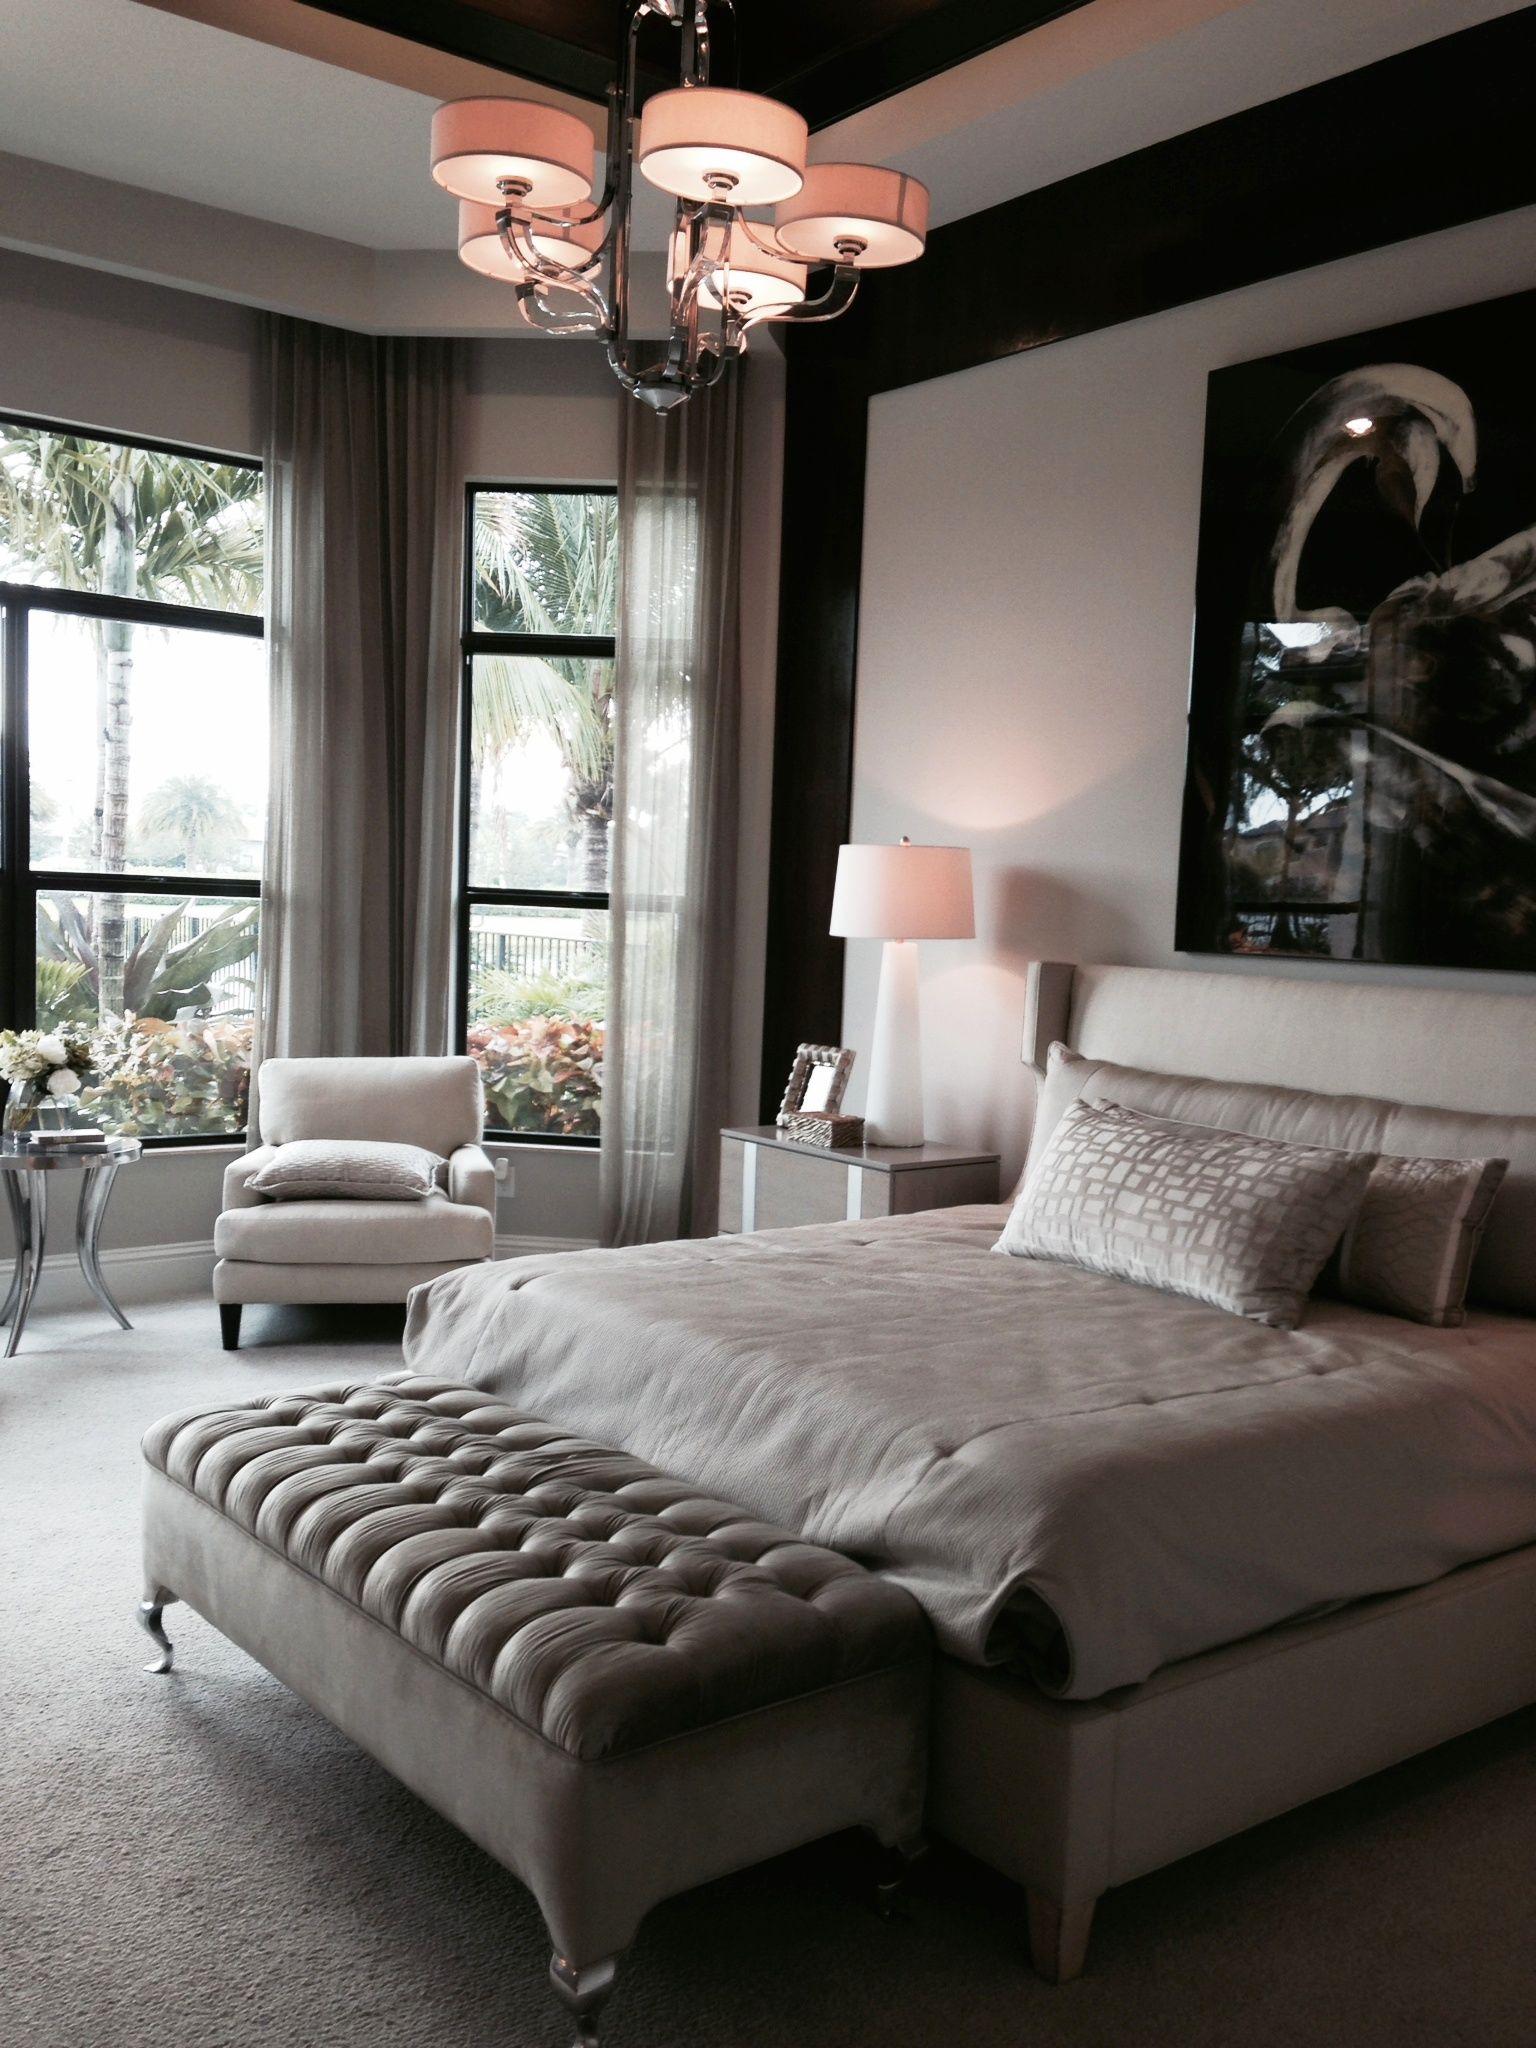 Model home bedroom   Inside a Home in 2019   Bedroom decor ... on Model Bedroom Interior Design  id=24661